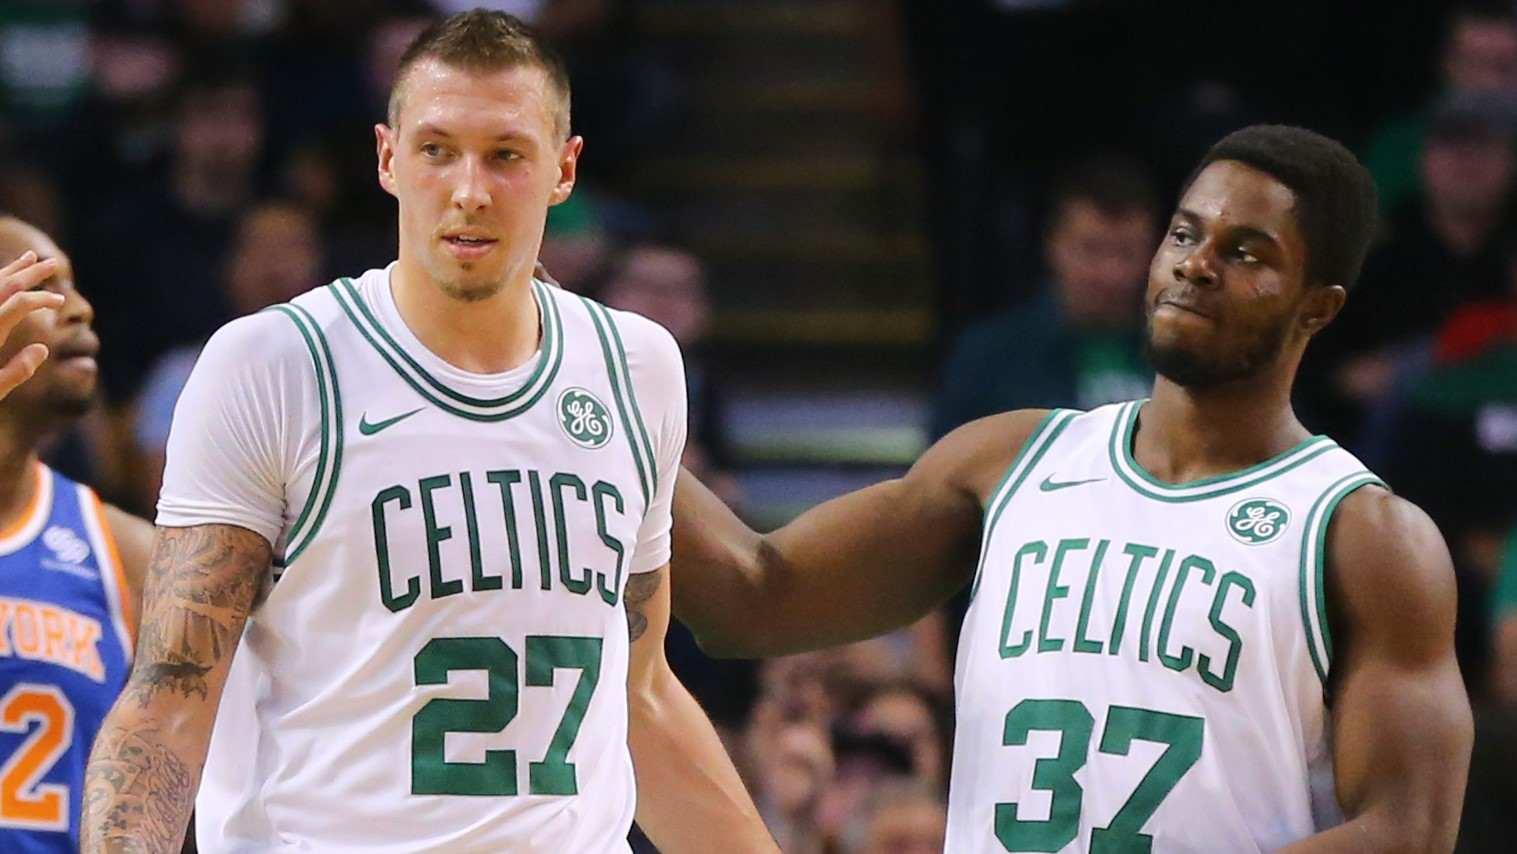 Celtics: Daniel Theis y Semi Ojeleye